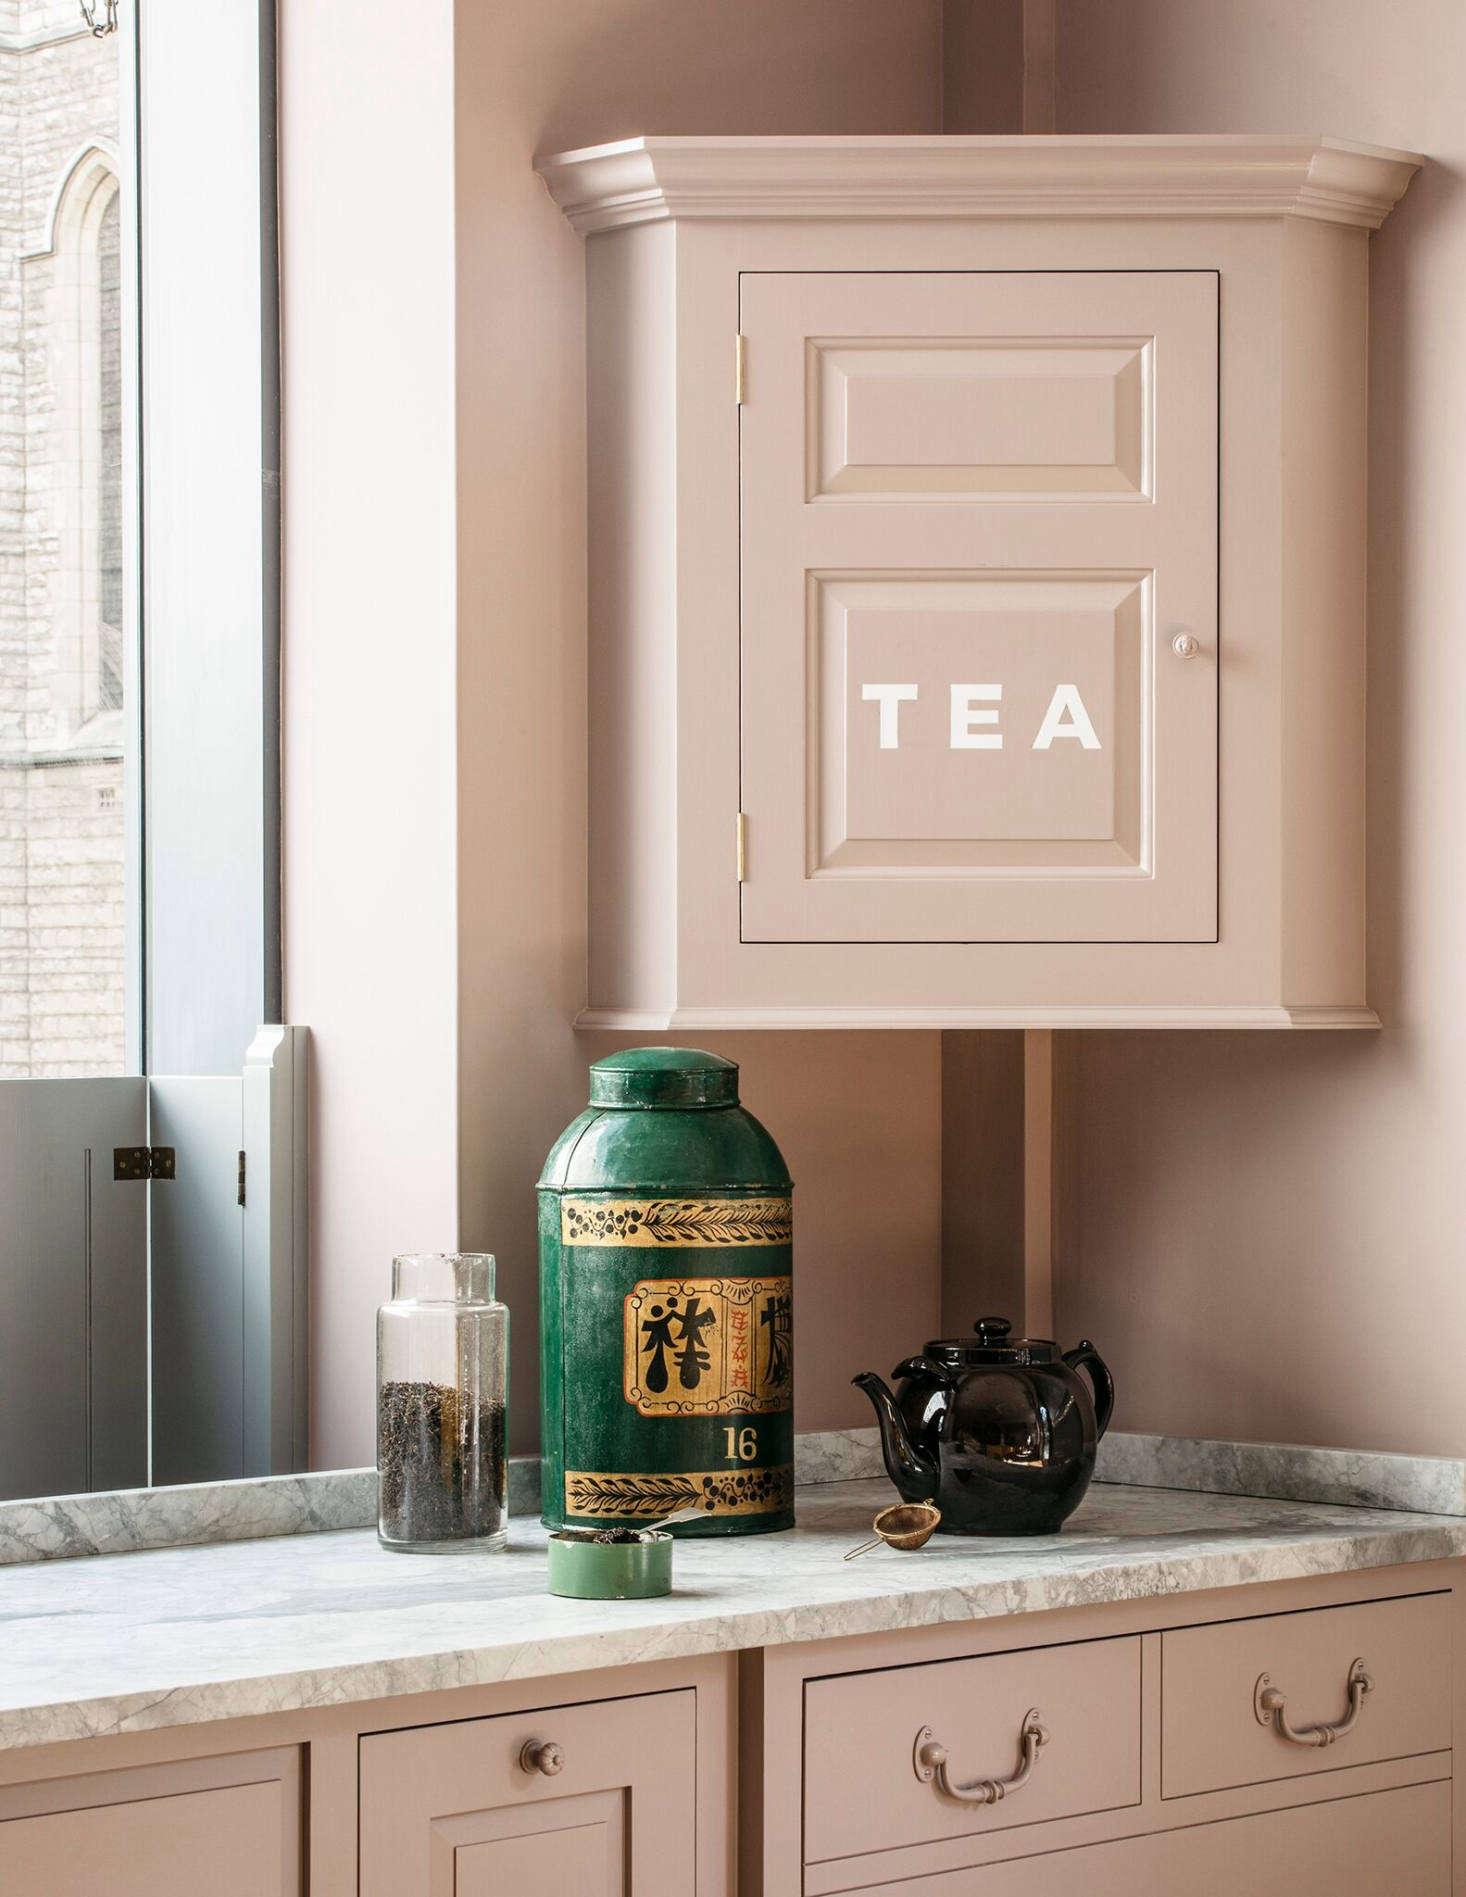 How British: a tea-making station.